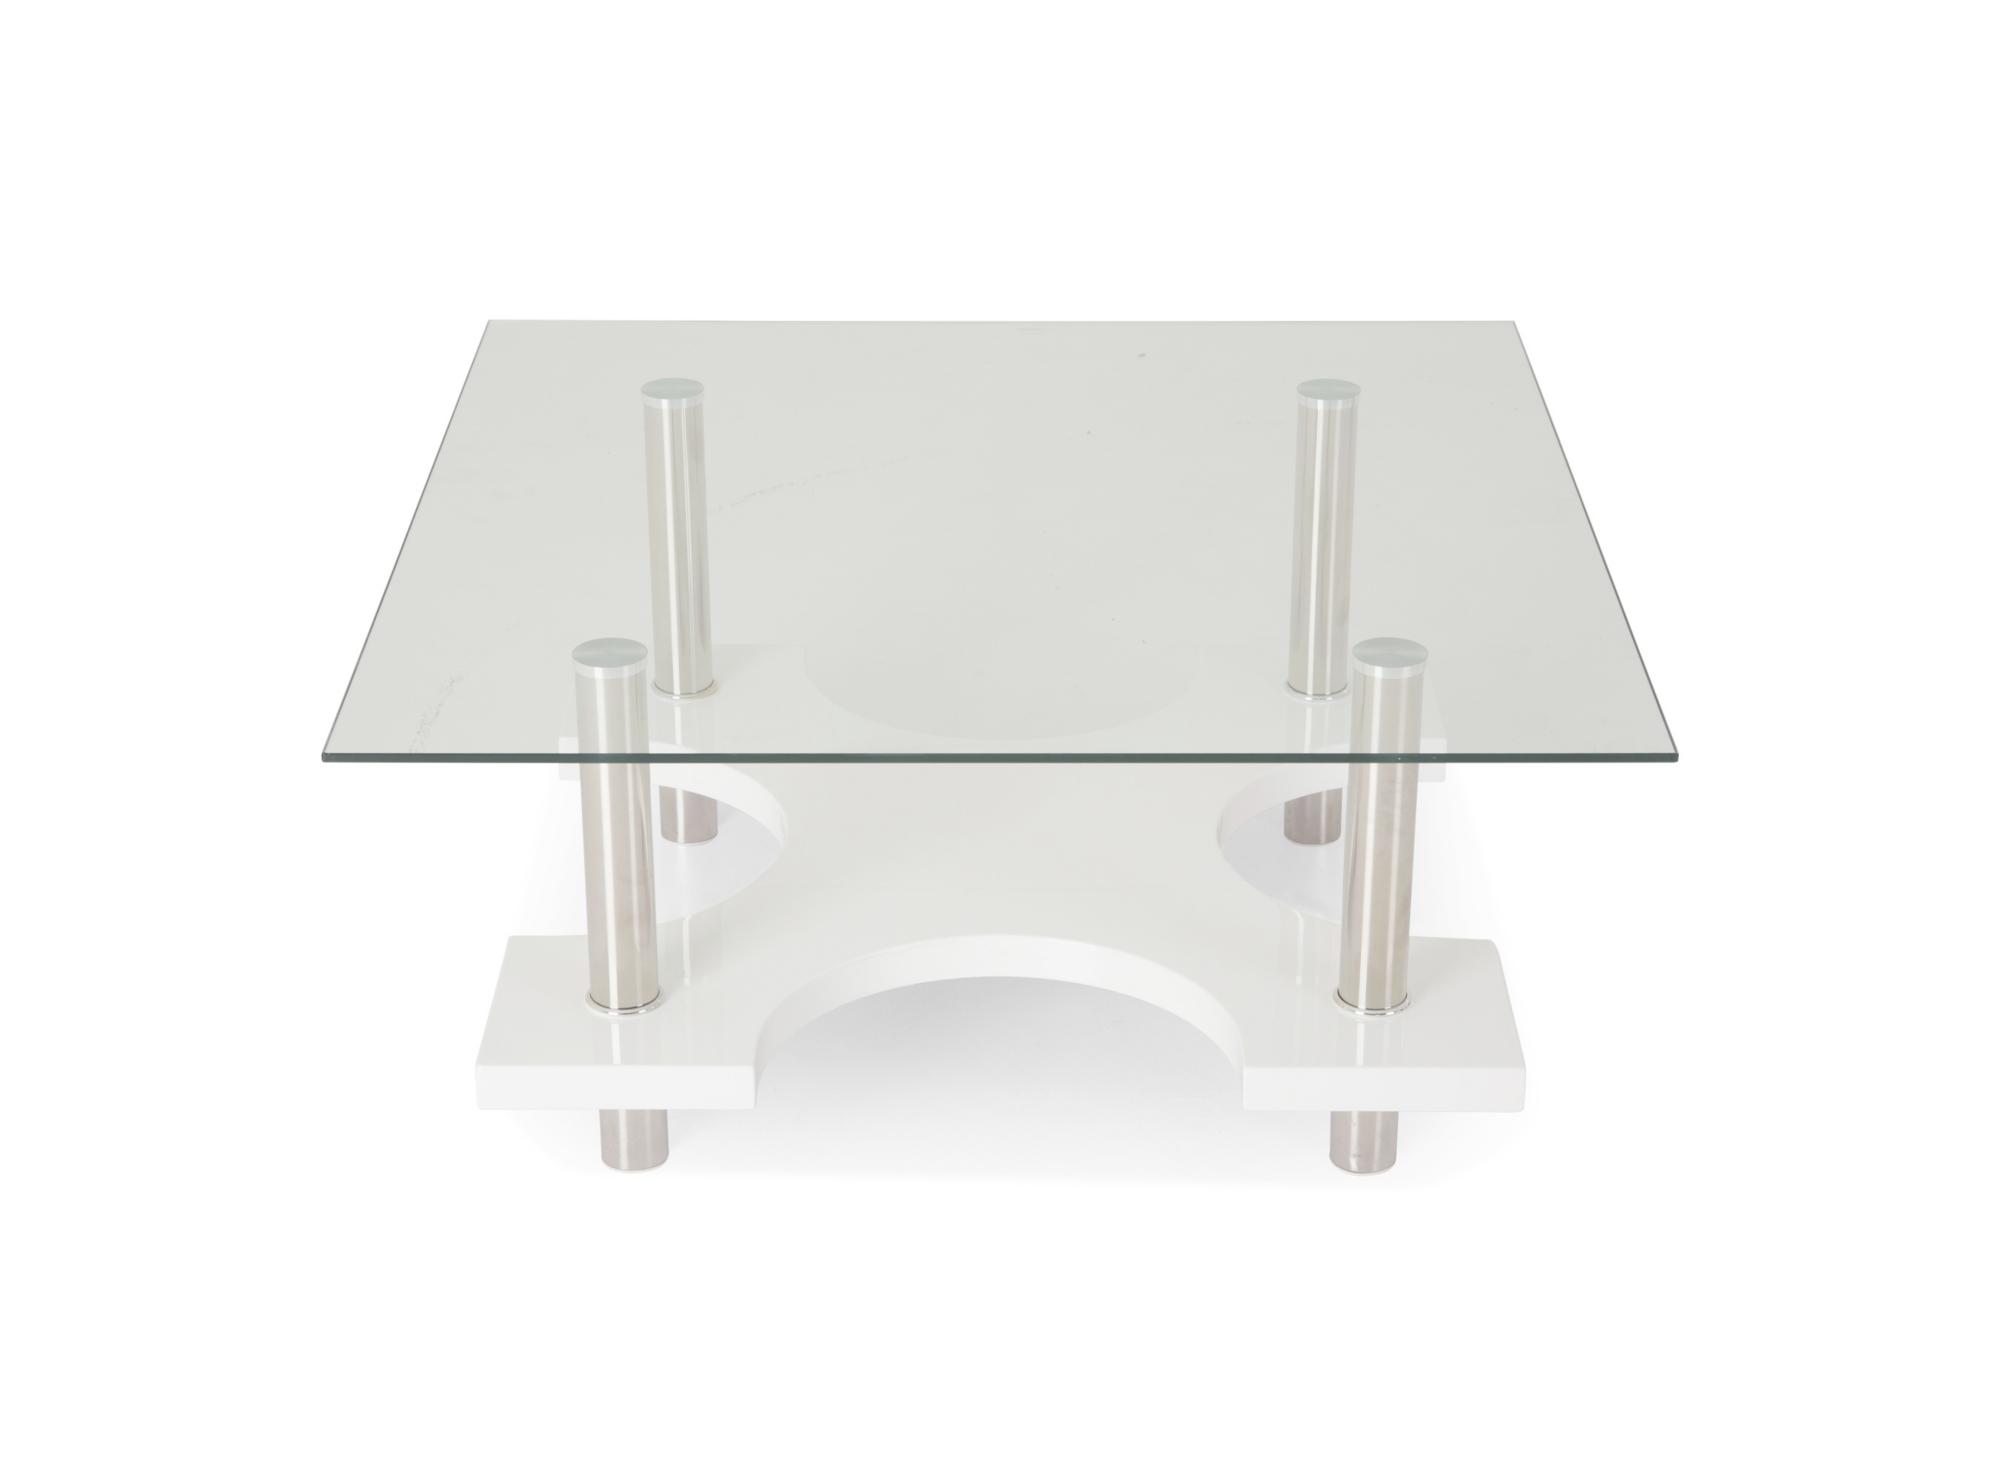 Table basse carree. 2 plateaux. pietement en acier inoxydable. platea ...